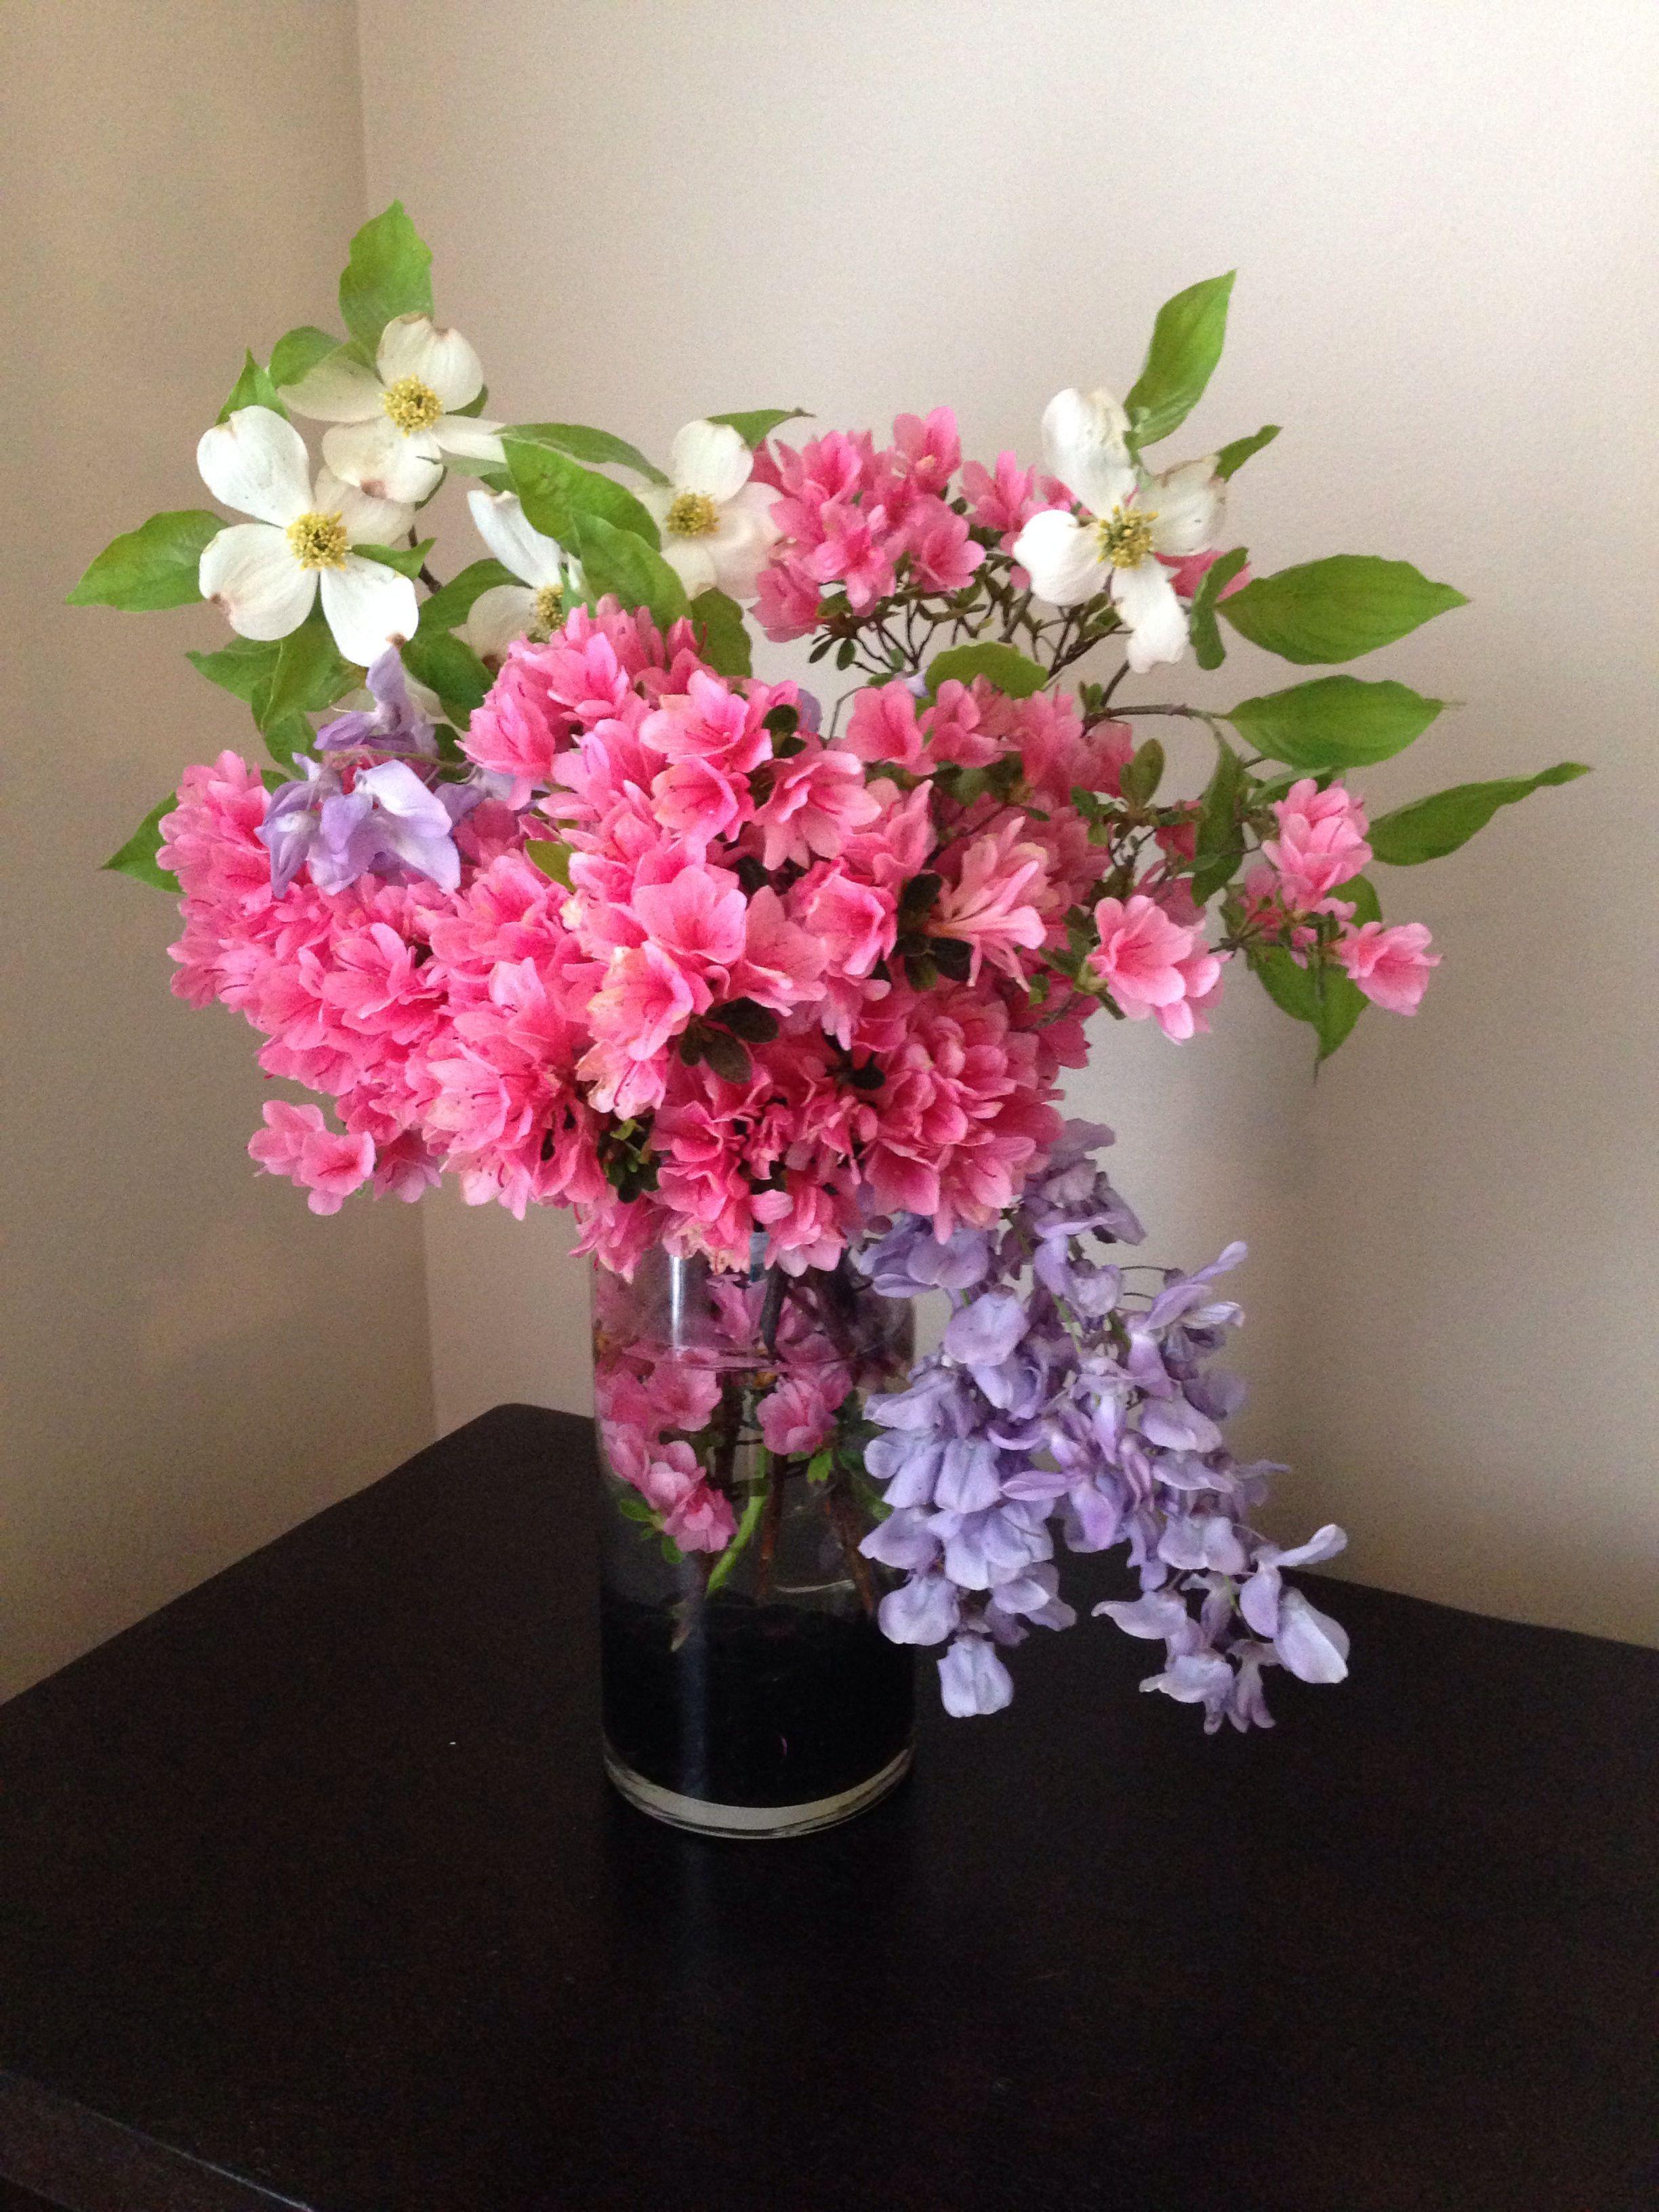 Backyard Bouquet With Azalea Wisteria And Dogwood Flower Arrangements Floral Arrangements Pink Dogwood